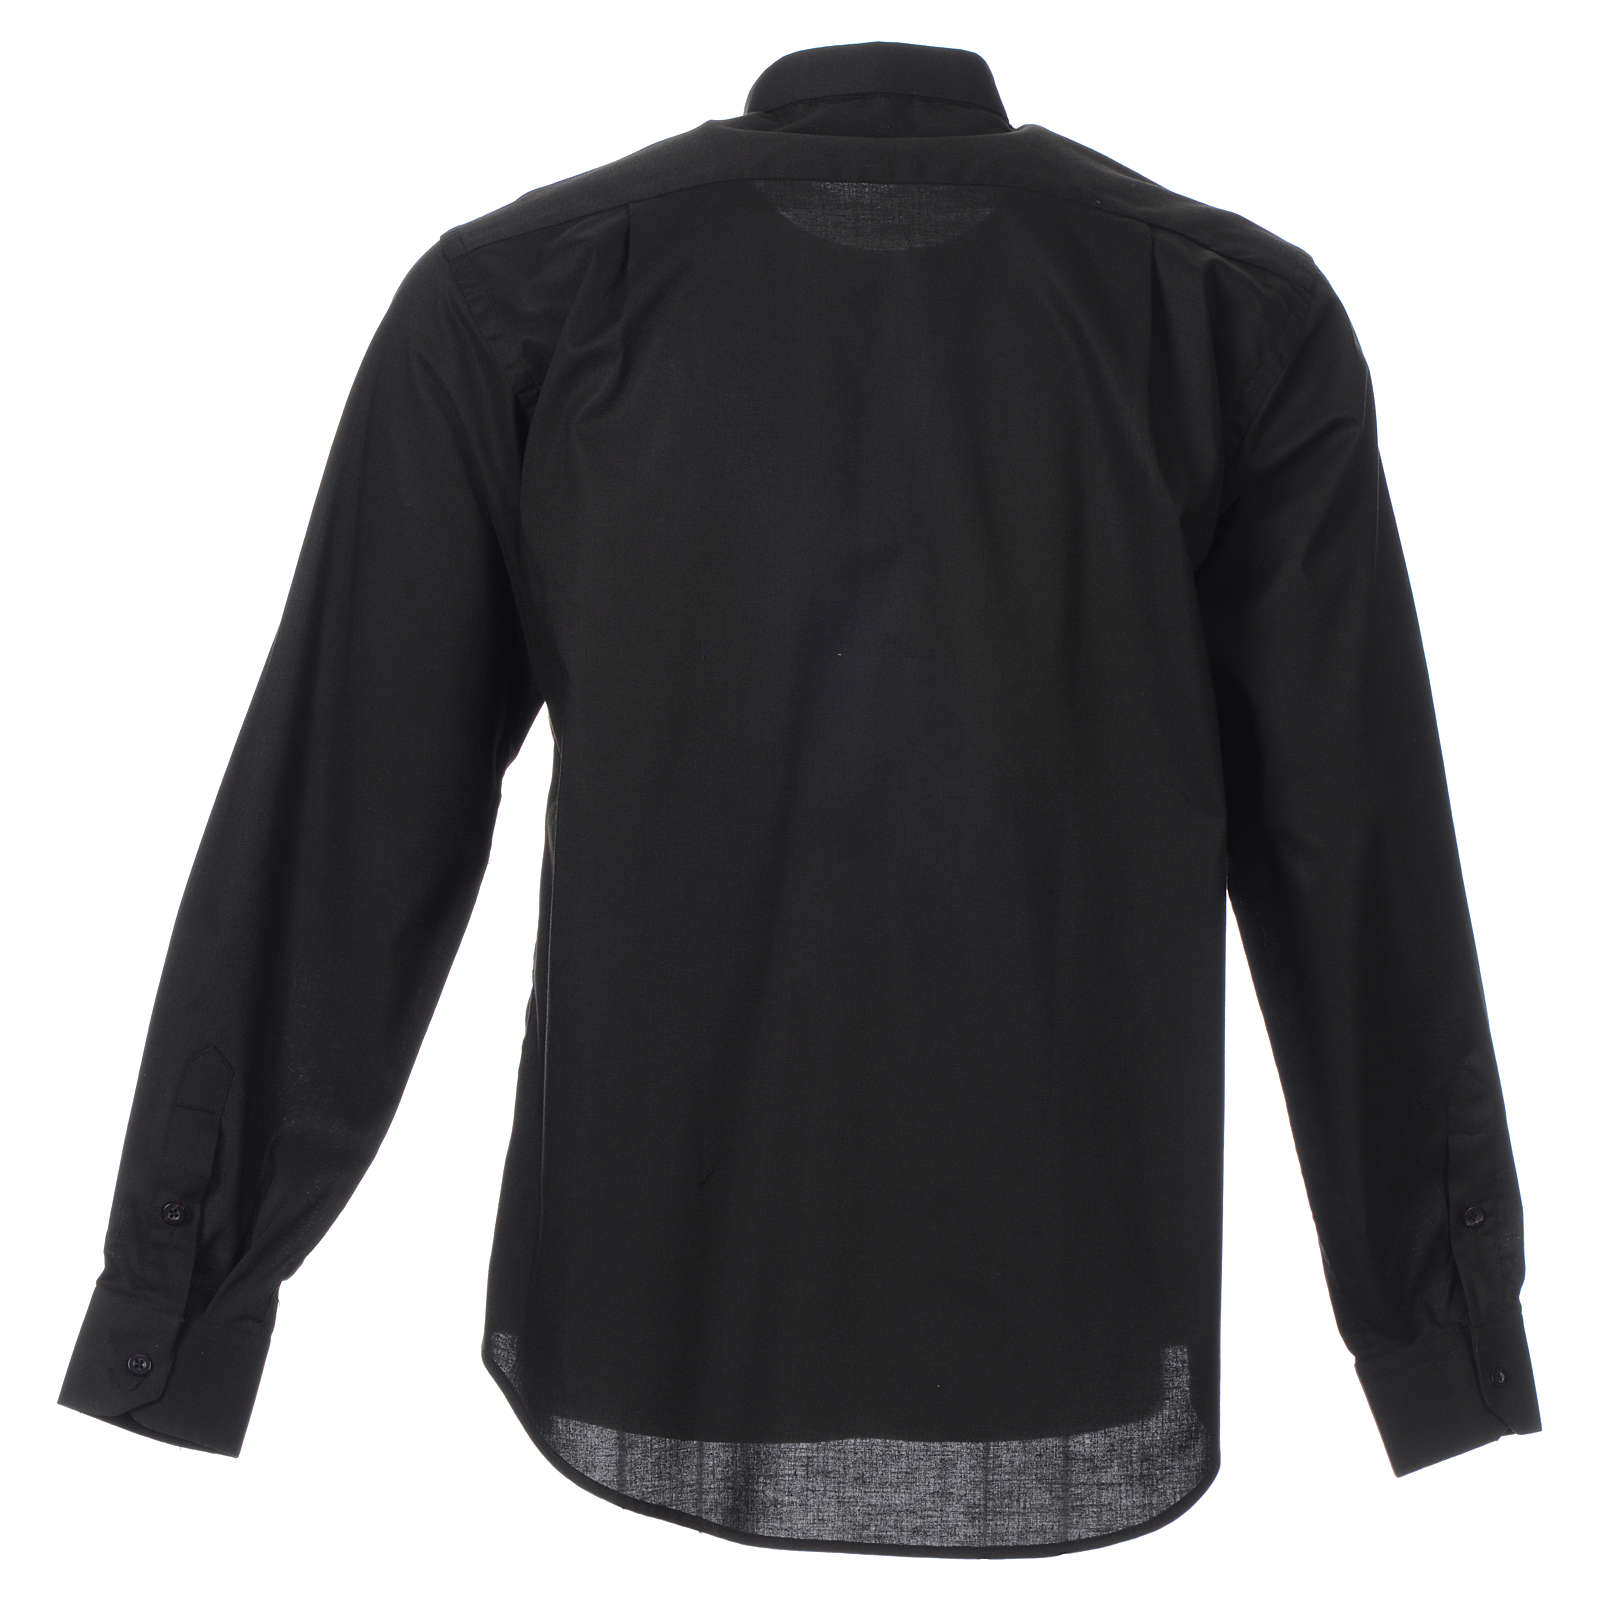 STOCK Camicia clergyman manica lunga misto nera 4